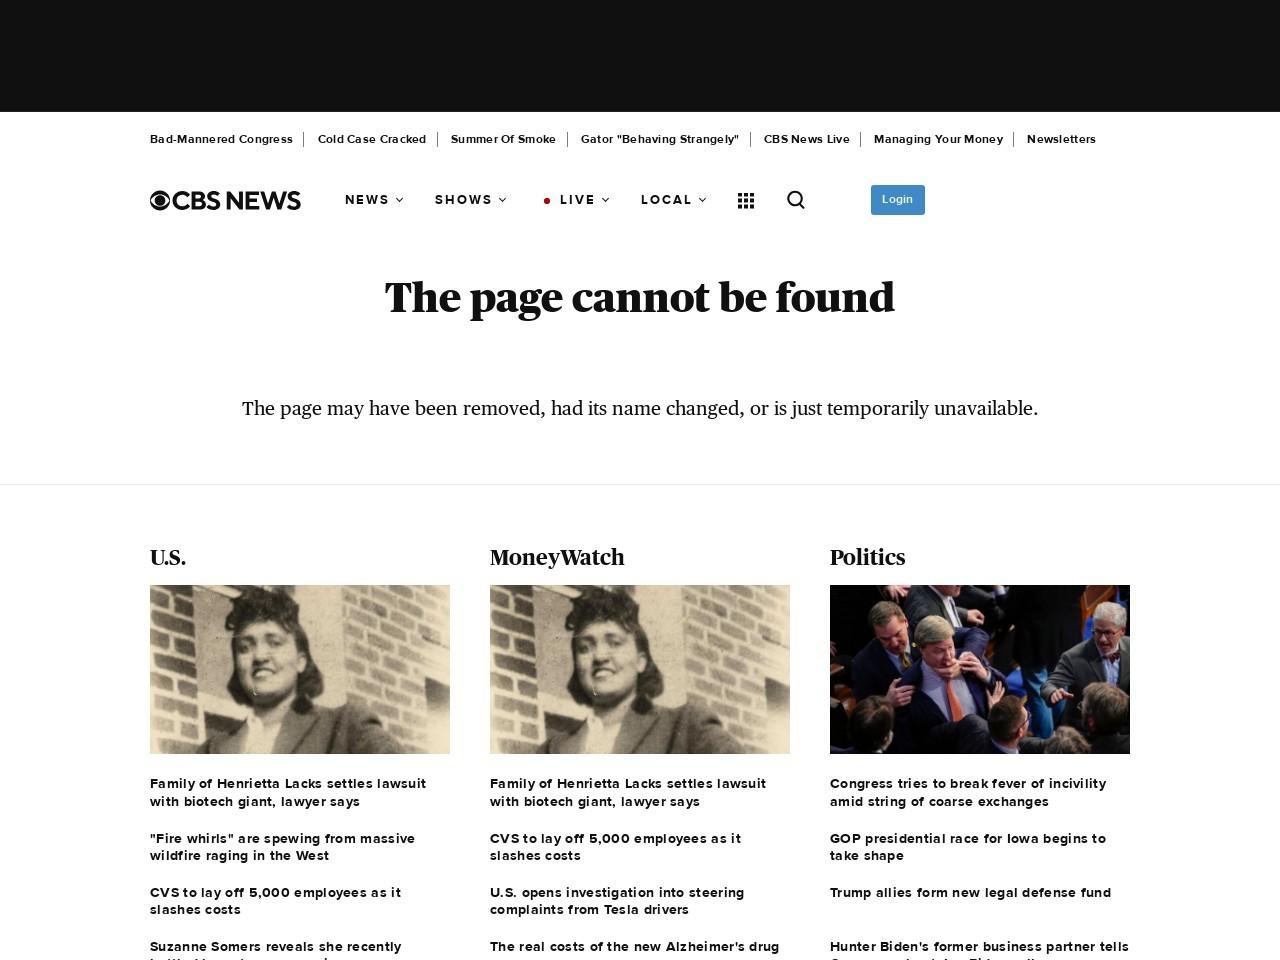 Tuesday Morning Quarterback: Jon Gruden resigns as Las Vegas Raiders head coach